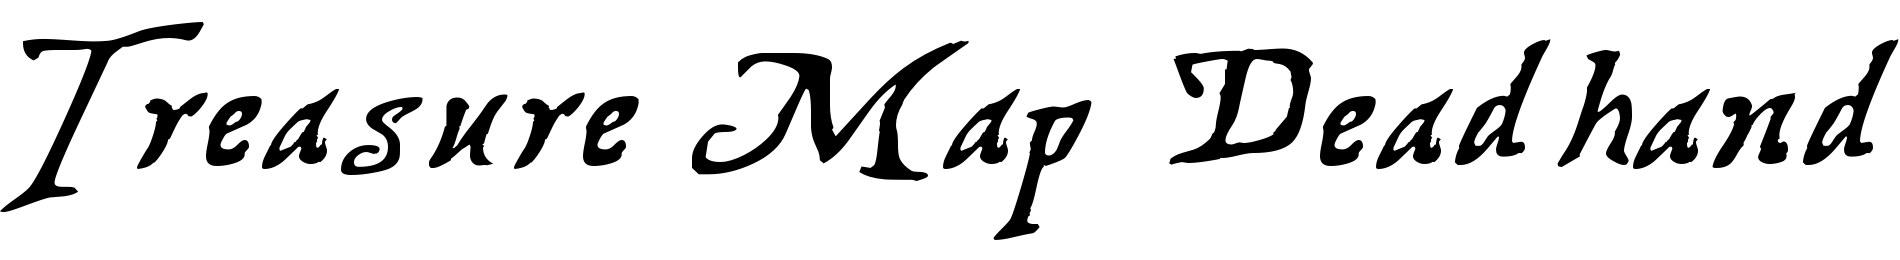 Treasure Map Deadhand